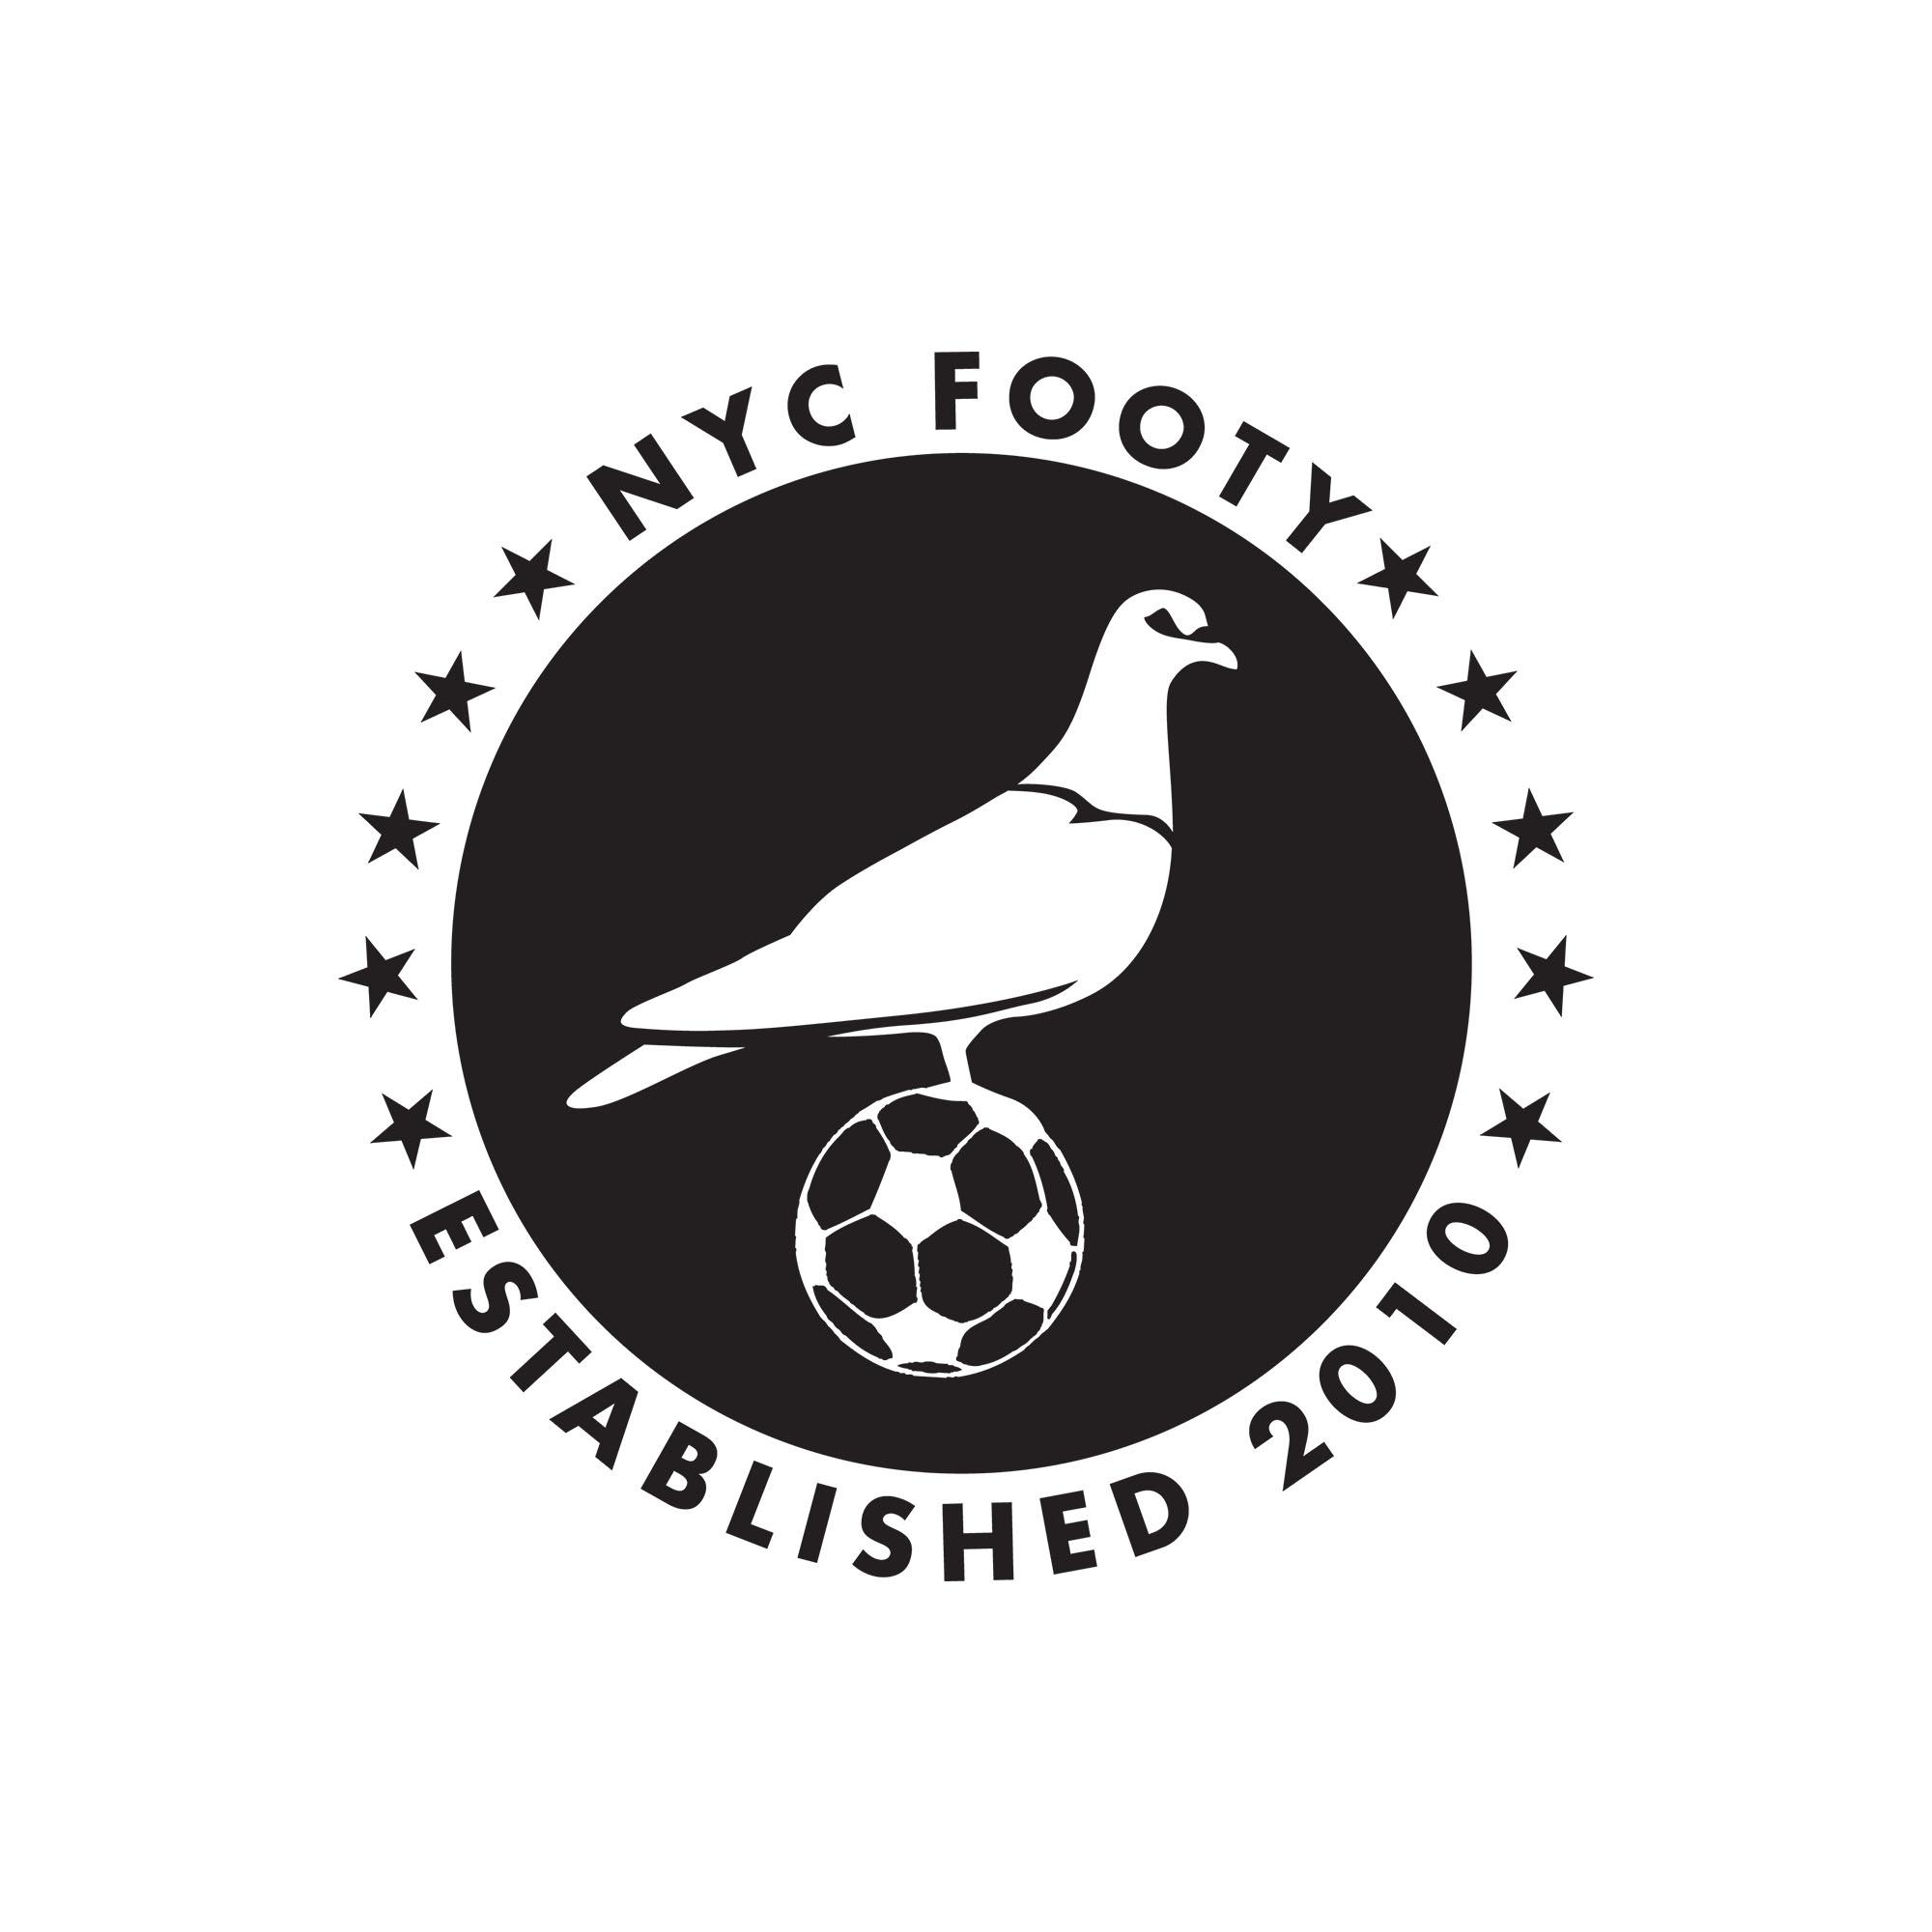 NYC Footy